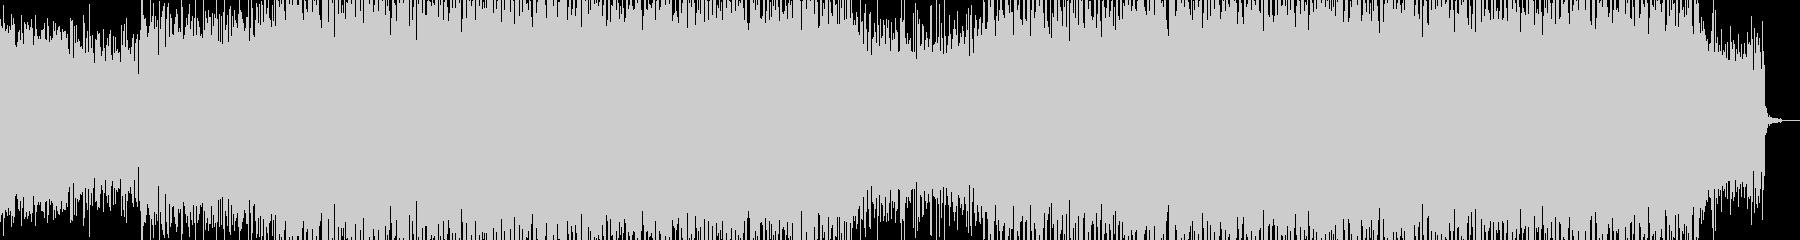 EDMポップで明るいクラブ系-71の未再生の波形